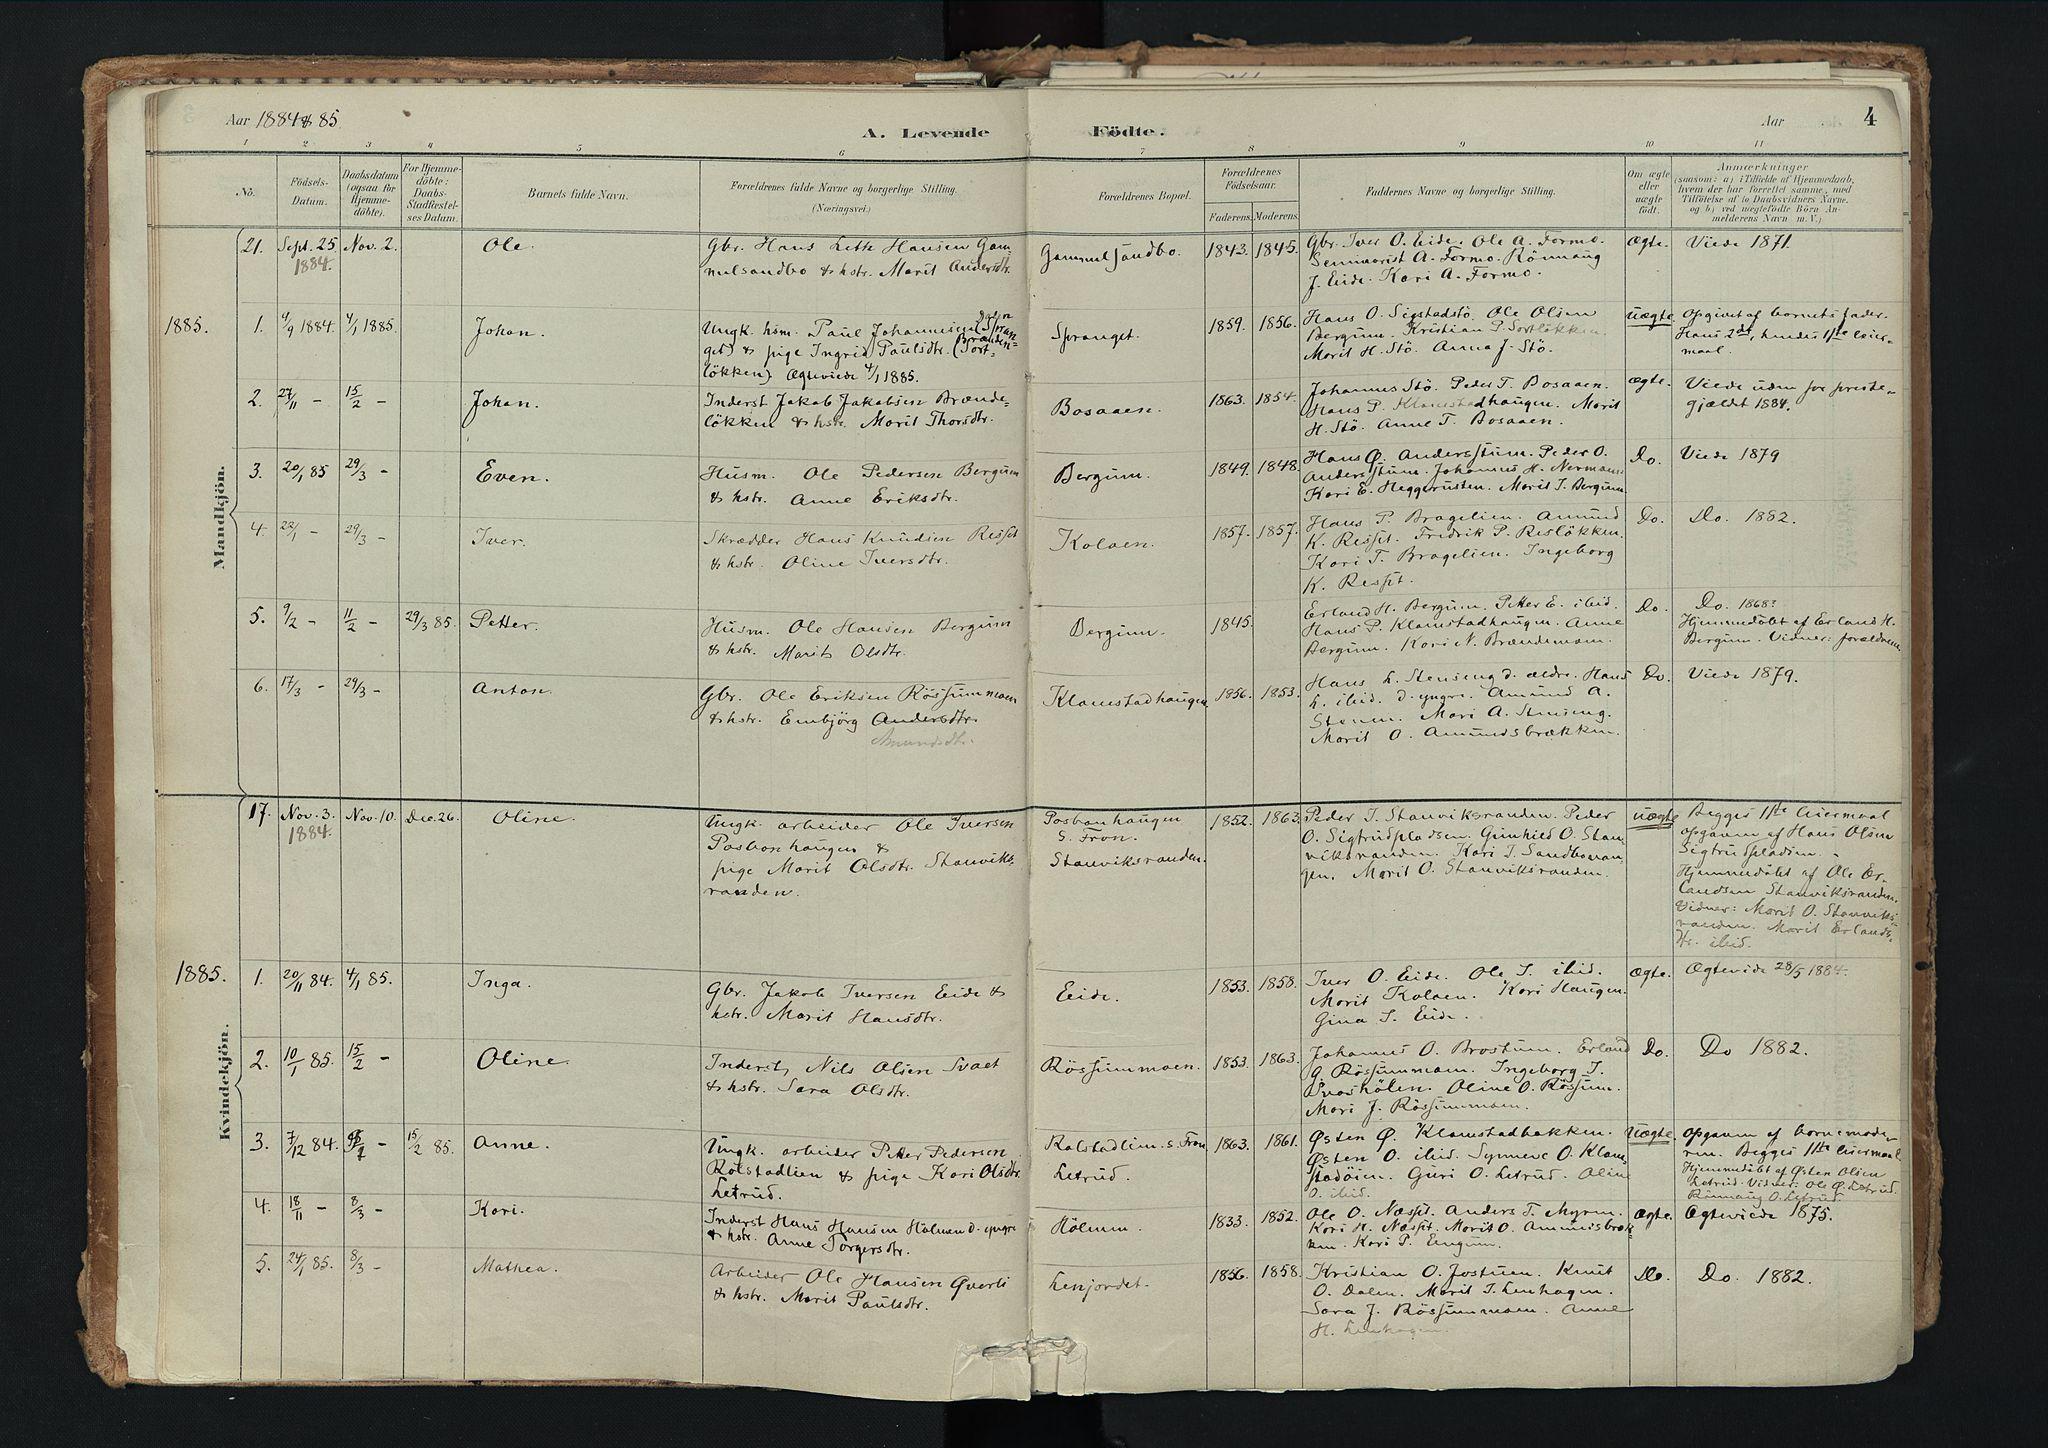 SAH, Nord-Fron prestekontor, Ministerialbok nr. 3, 1884-1914, s. 4